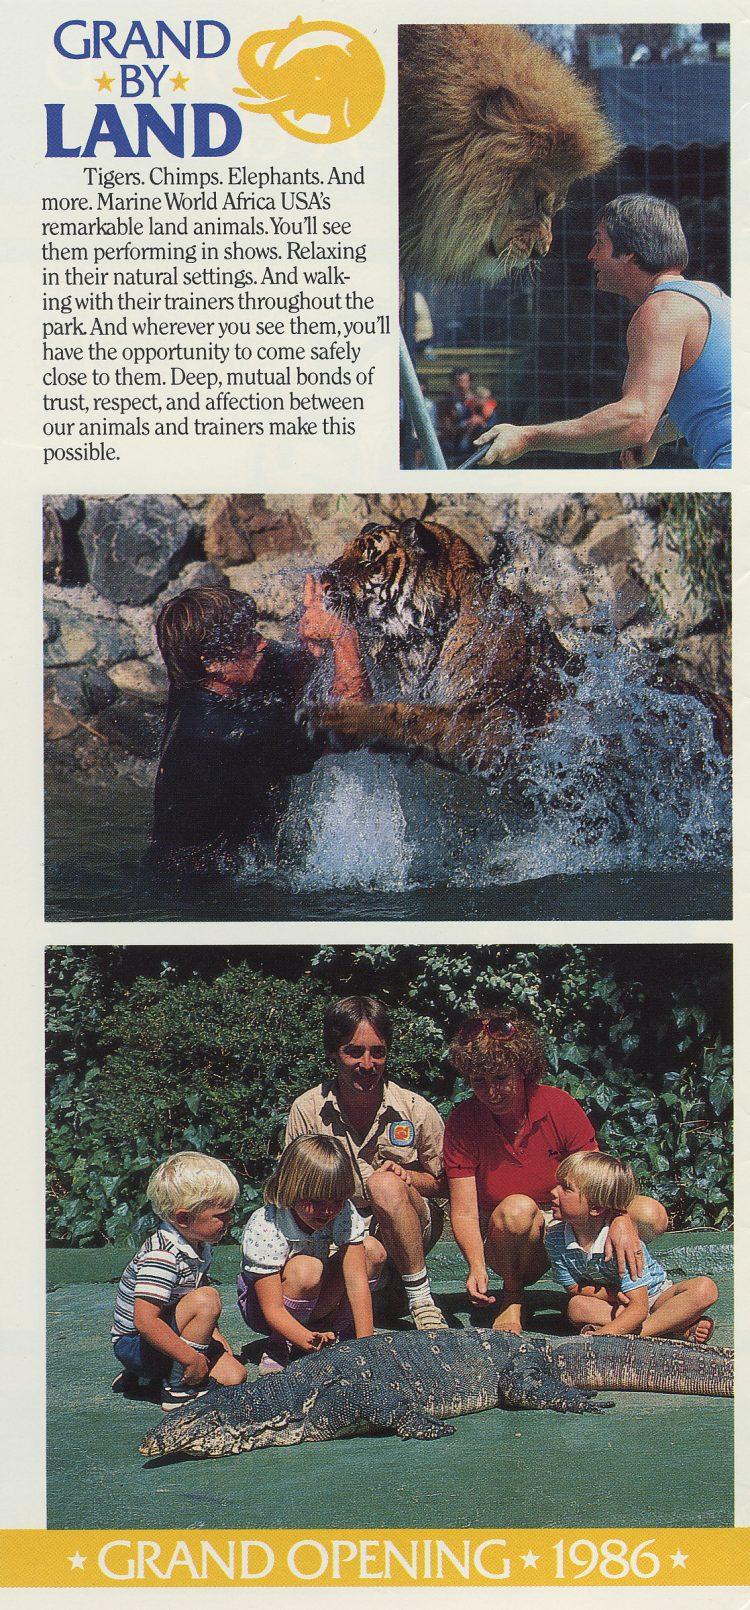 Marine World Africa USA - Grand Opening brochure 1986 (3)